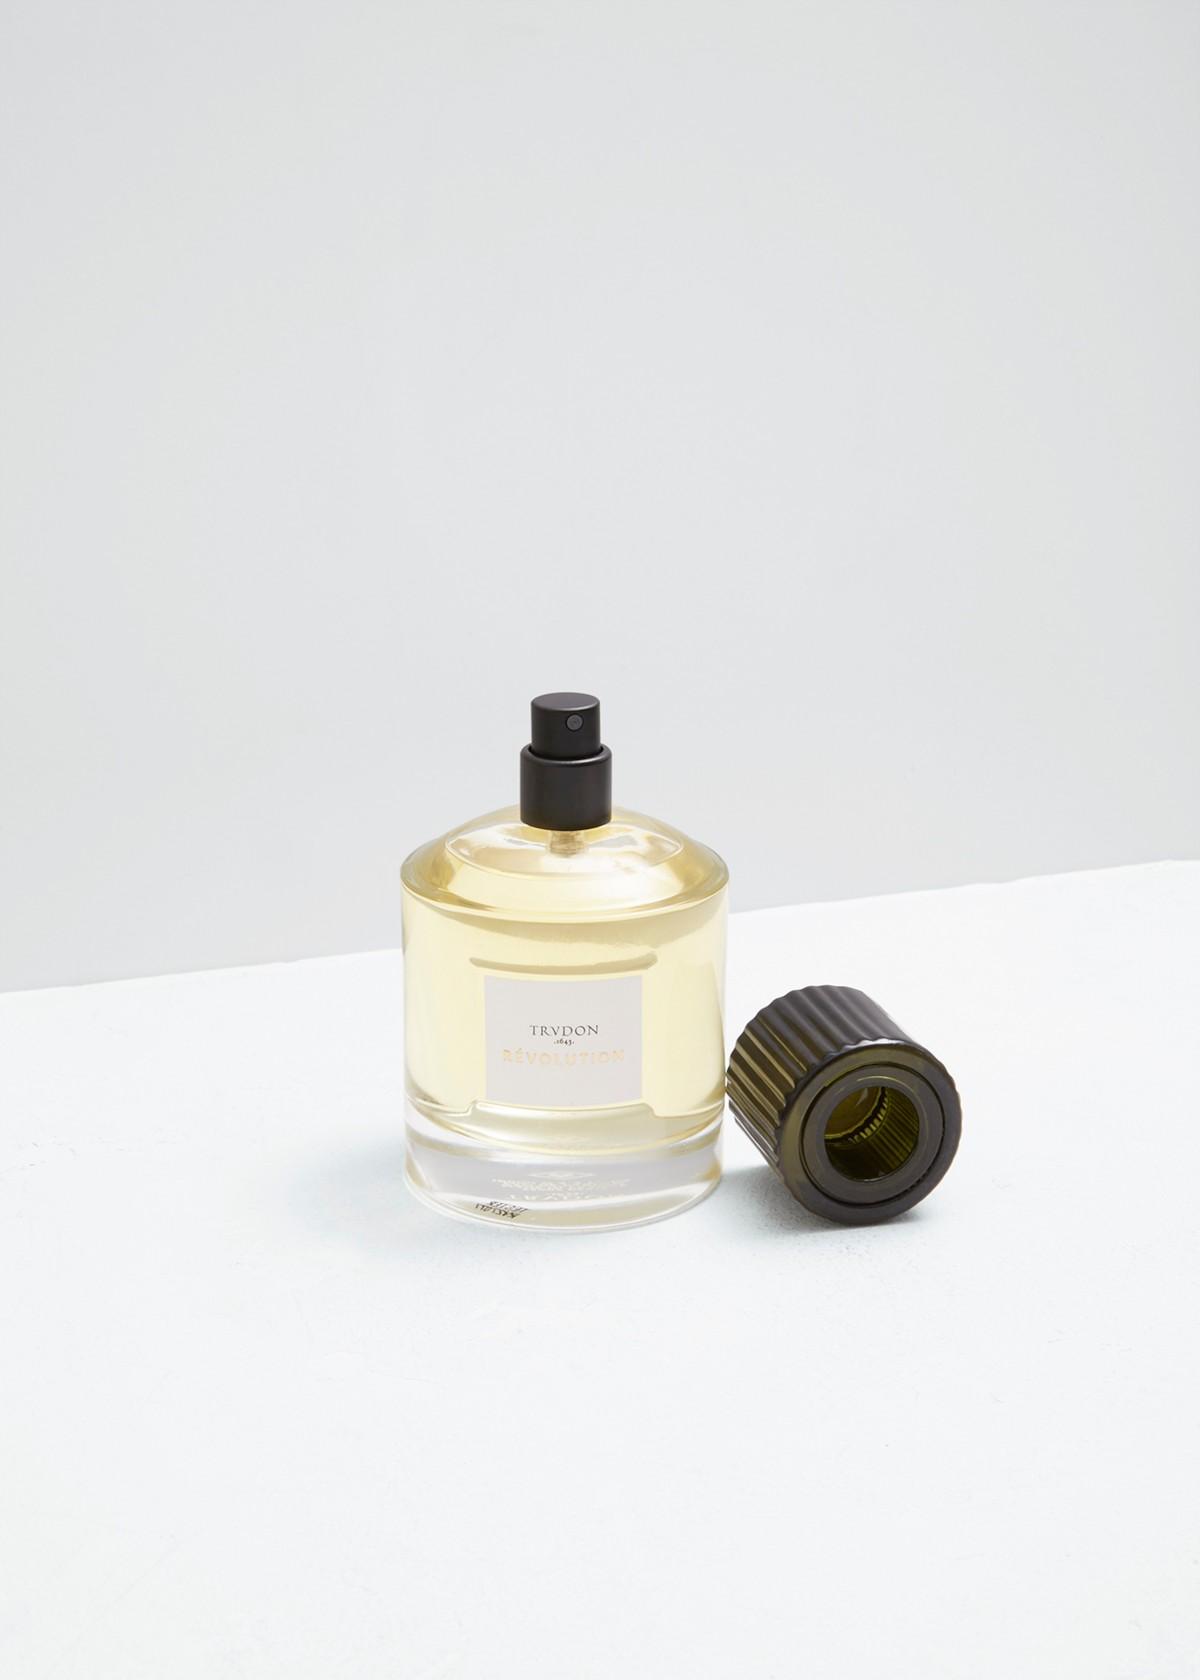 Cire-trudon-leparfum-Pauline Deltour-01.jpg